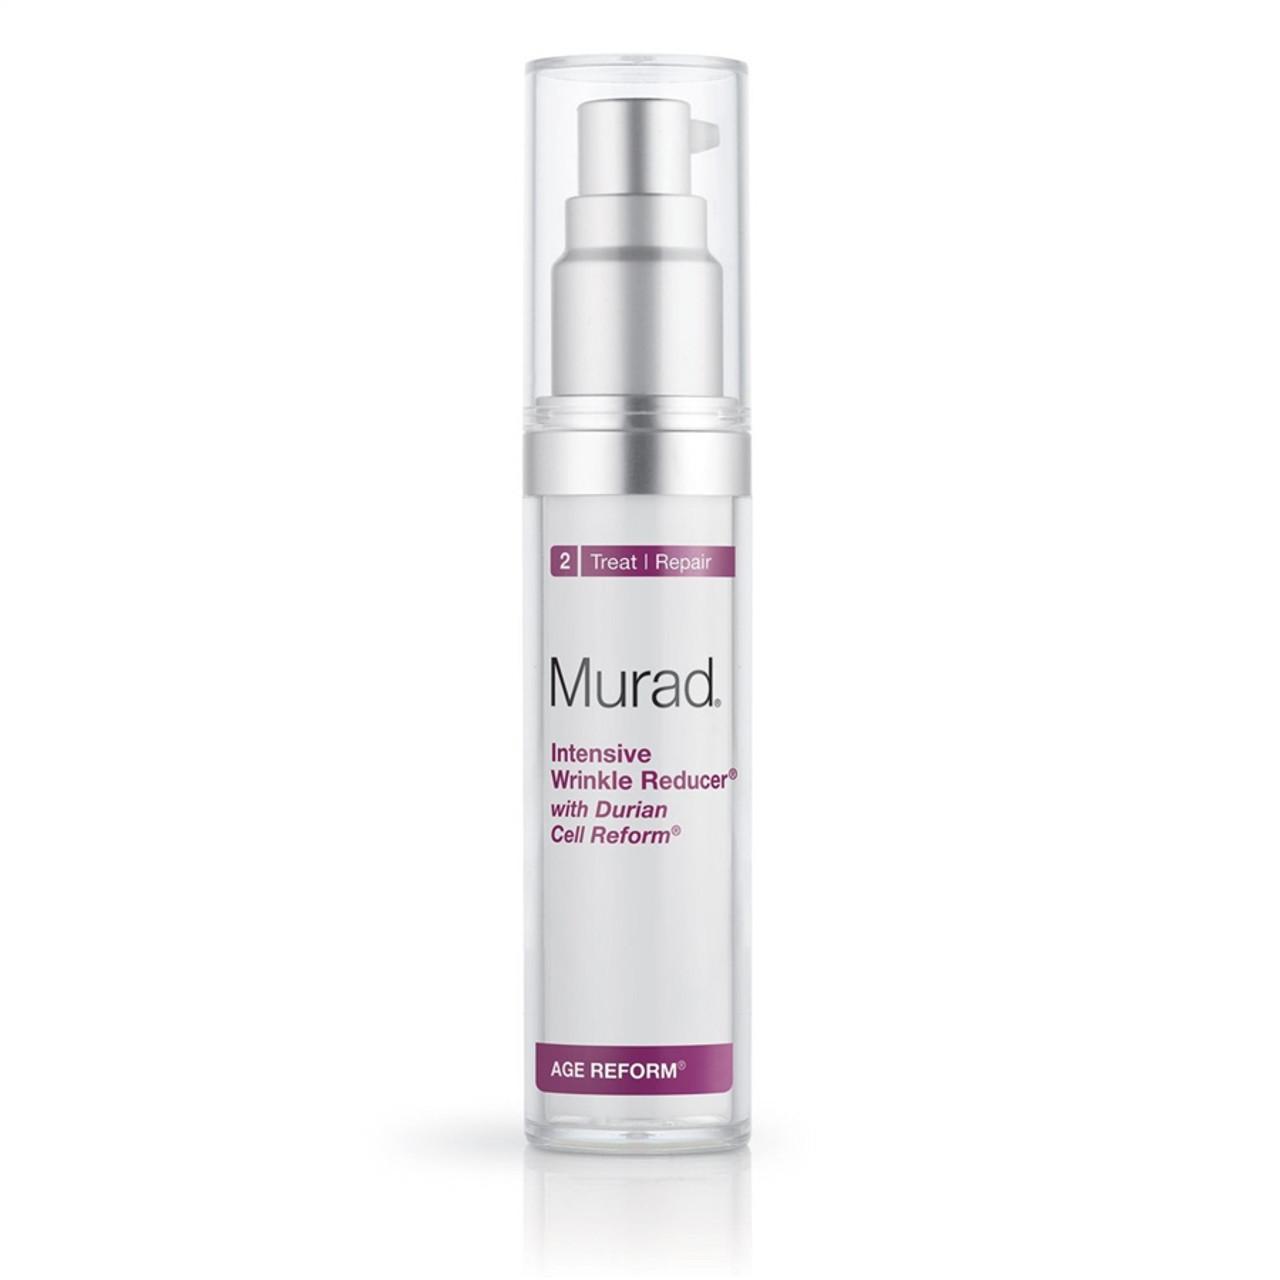 Murad Intensive Wrinkle Reducer 1oz